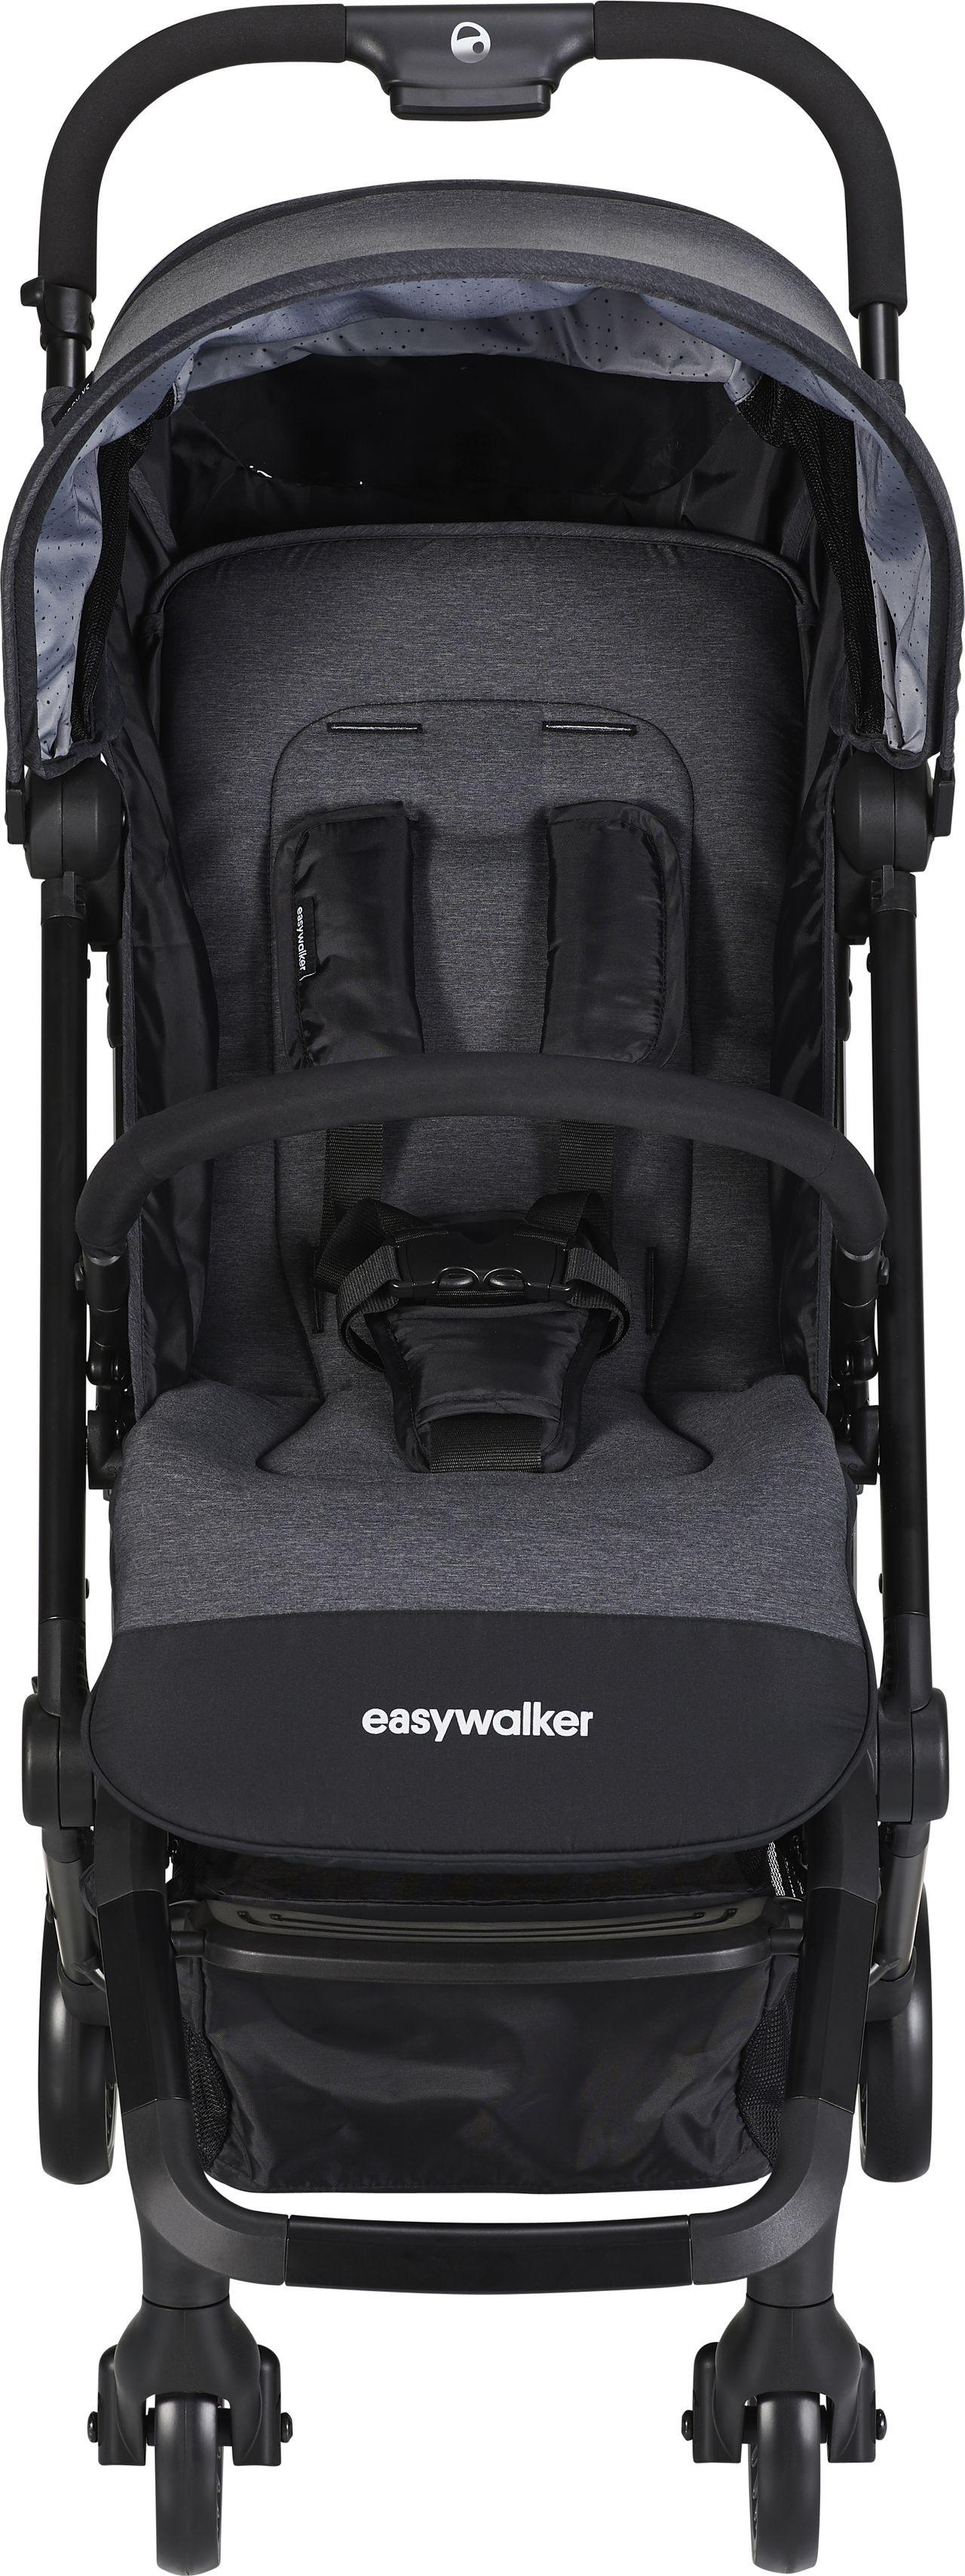 Easywalker Buggy XS Melange Grey kaufen - Kleine Fabriek